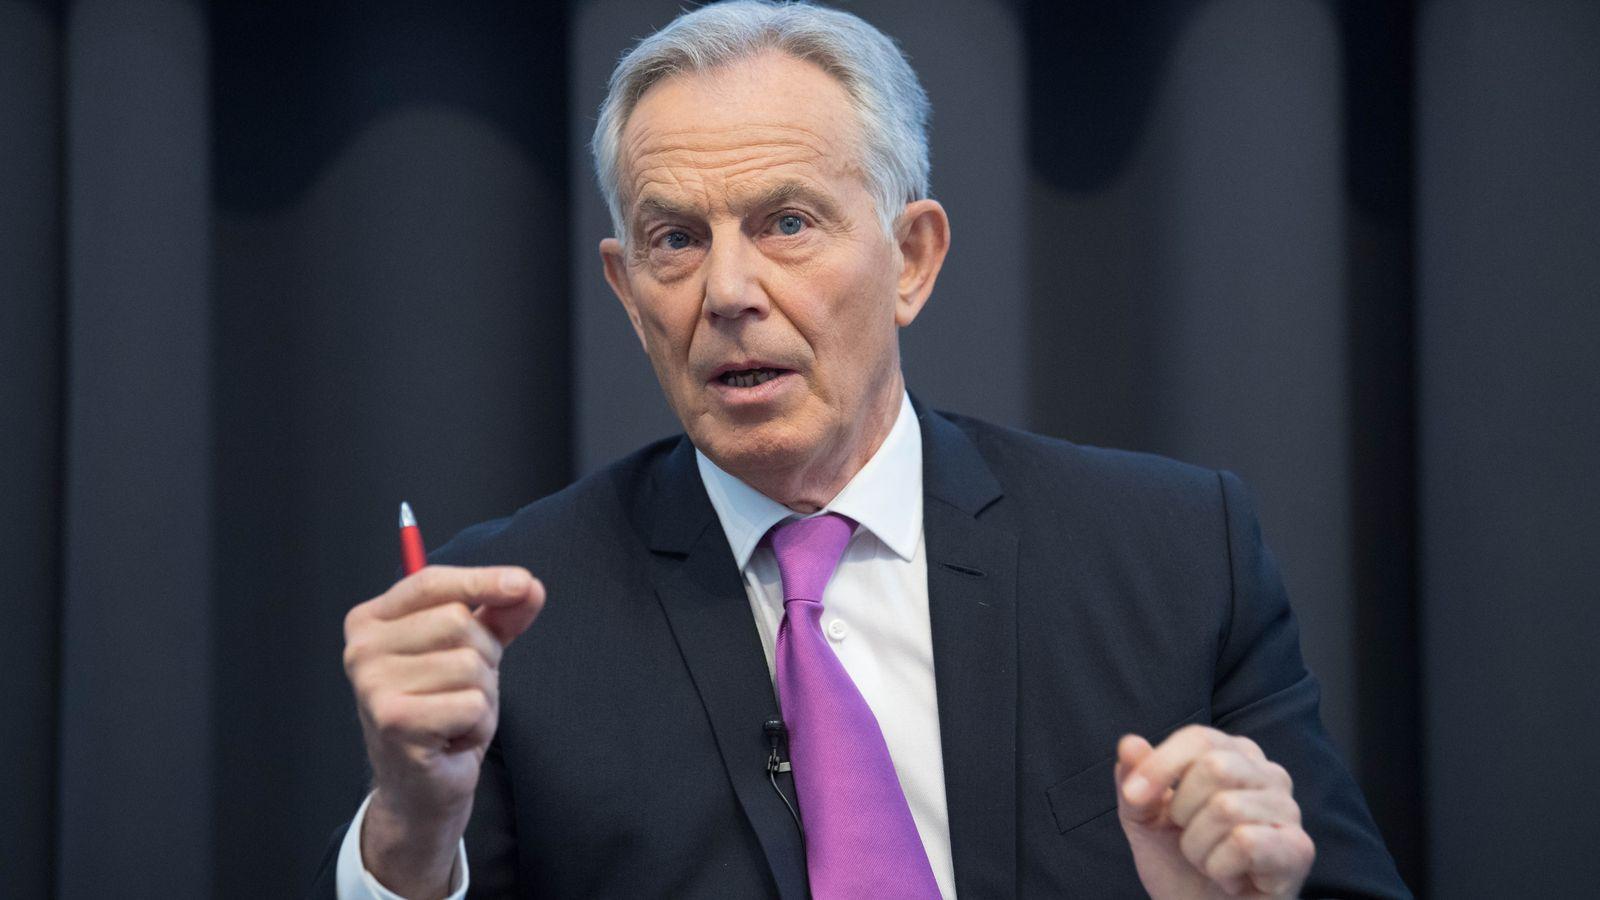 Ex-PM Tony Blair raises prospect of Labour-Lib Dem alliance if party are to win power